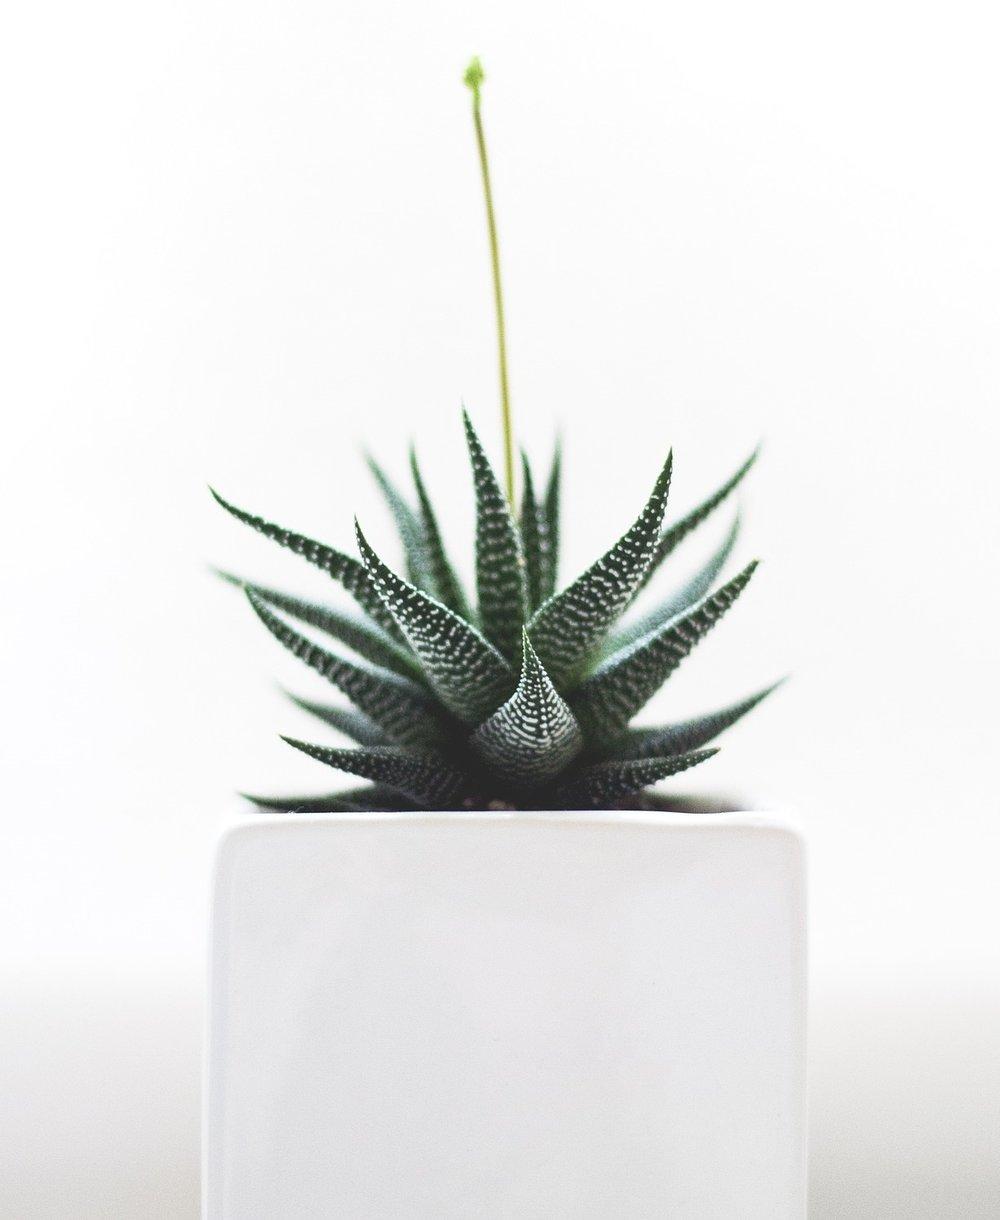 plant-1842299_1920.jpg